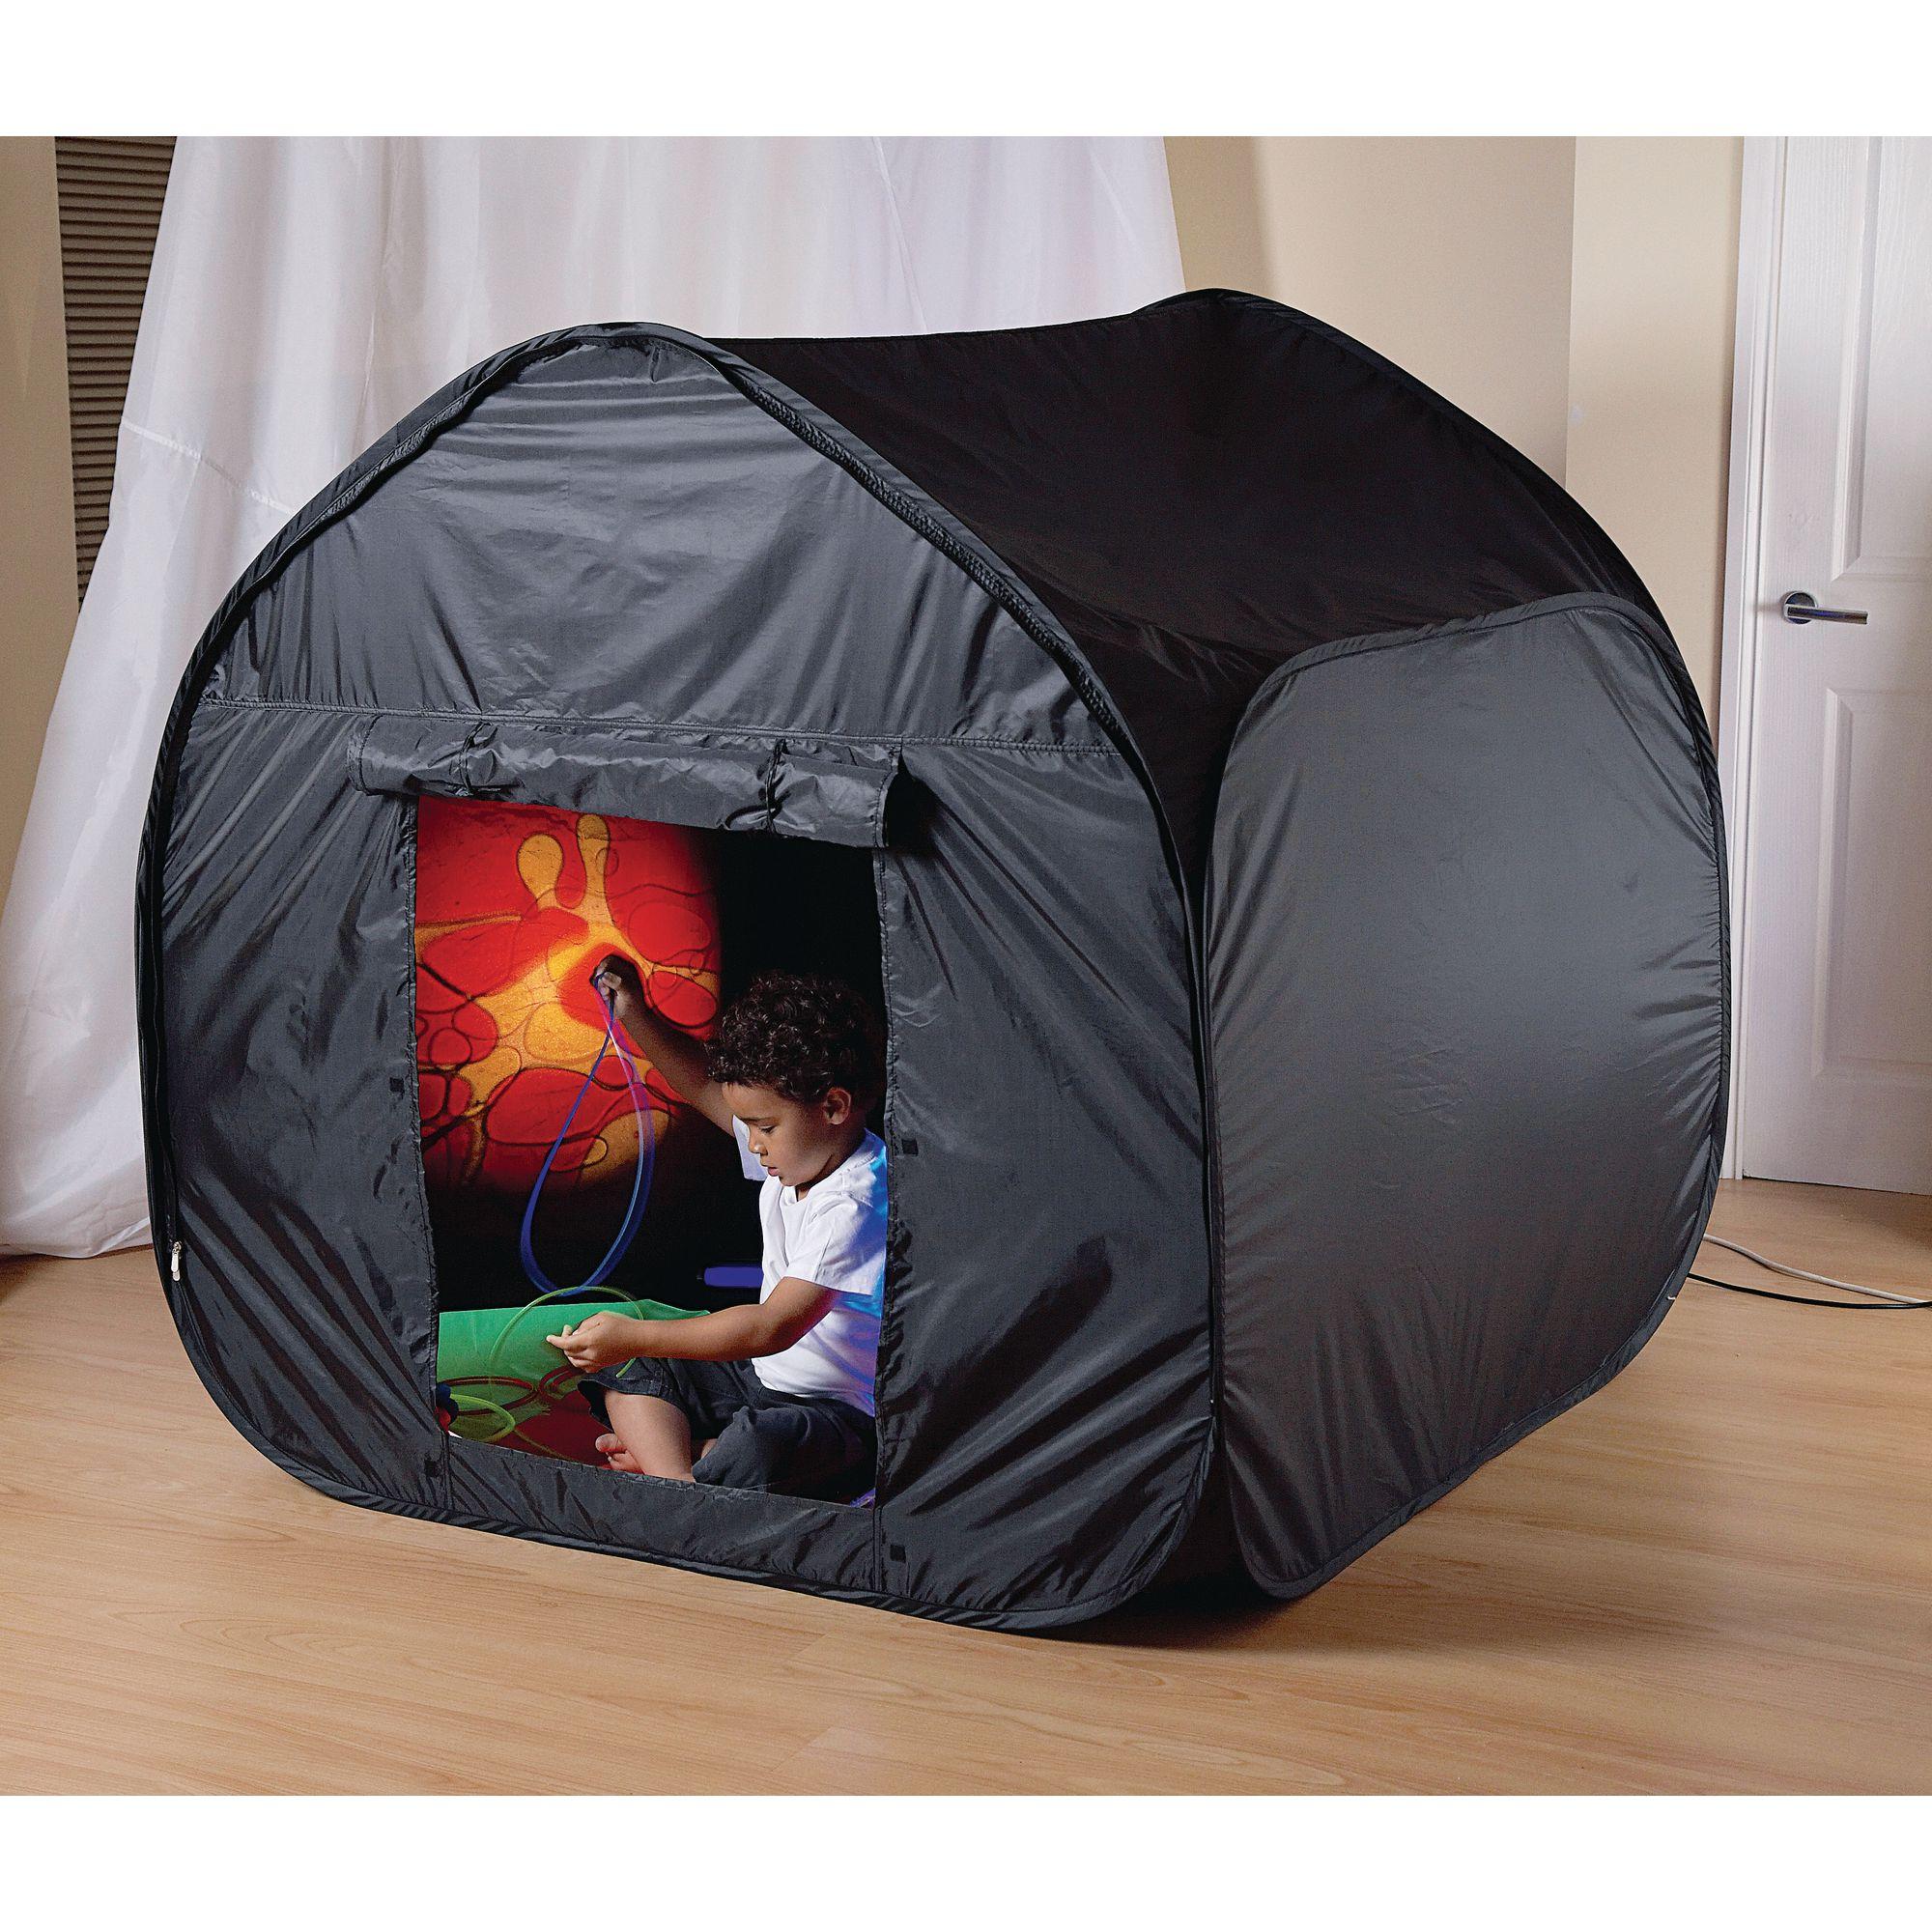 Sensory Black Out Tent - Black & Sensory Black Out Tent - Black | LDA Resources